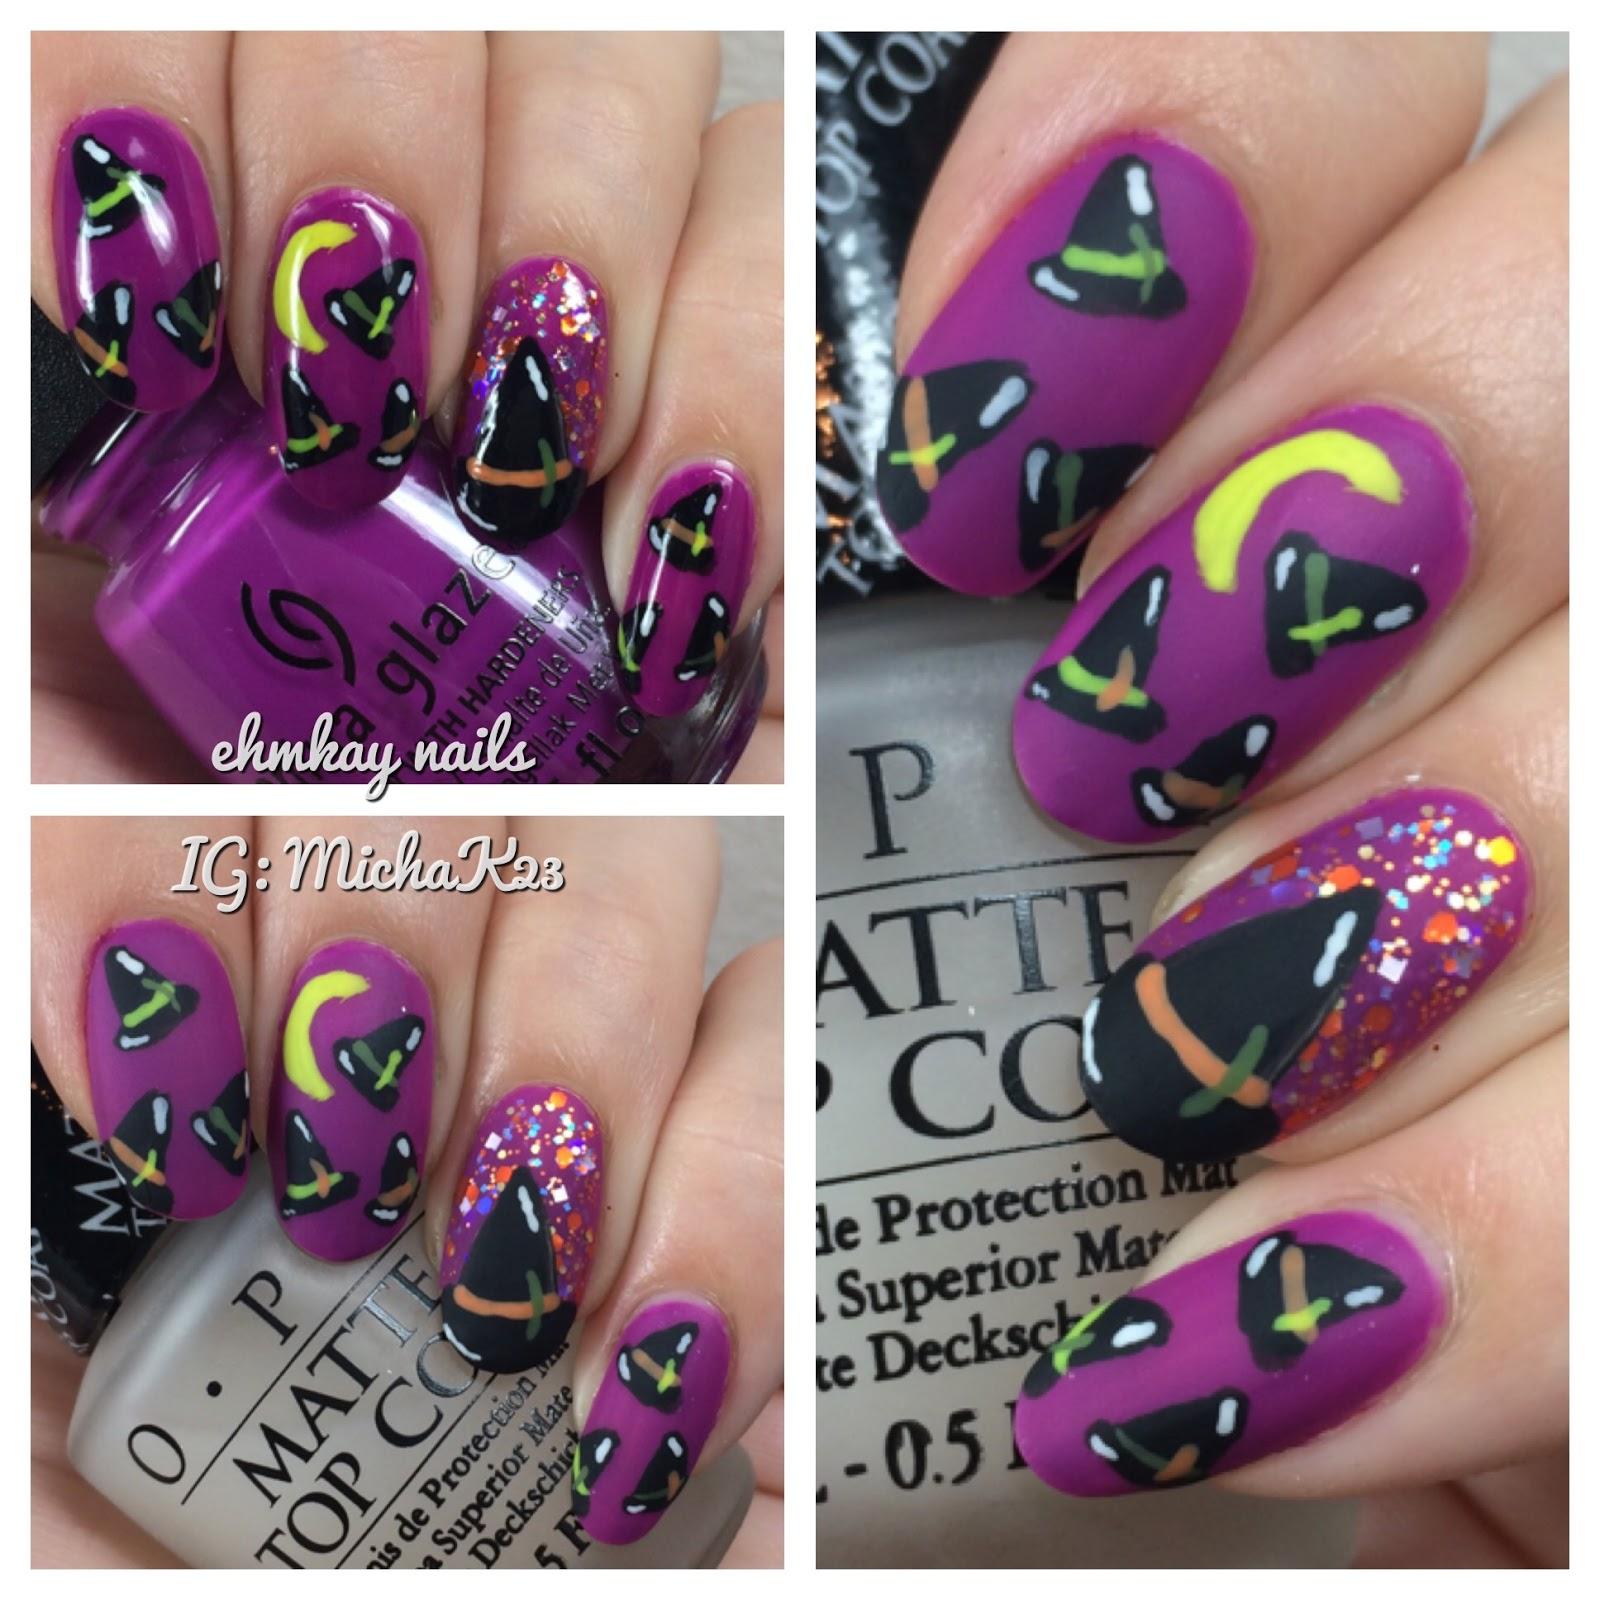 ehmkay nails: Witch Hats Halloween Nail Art